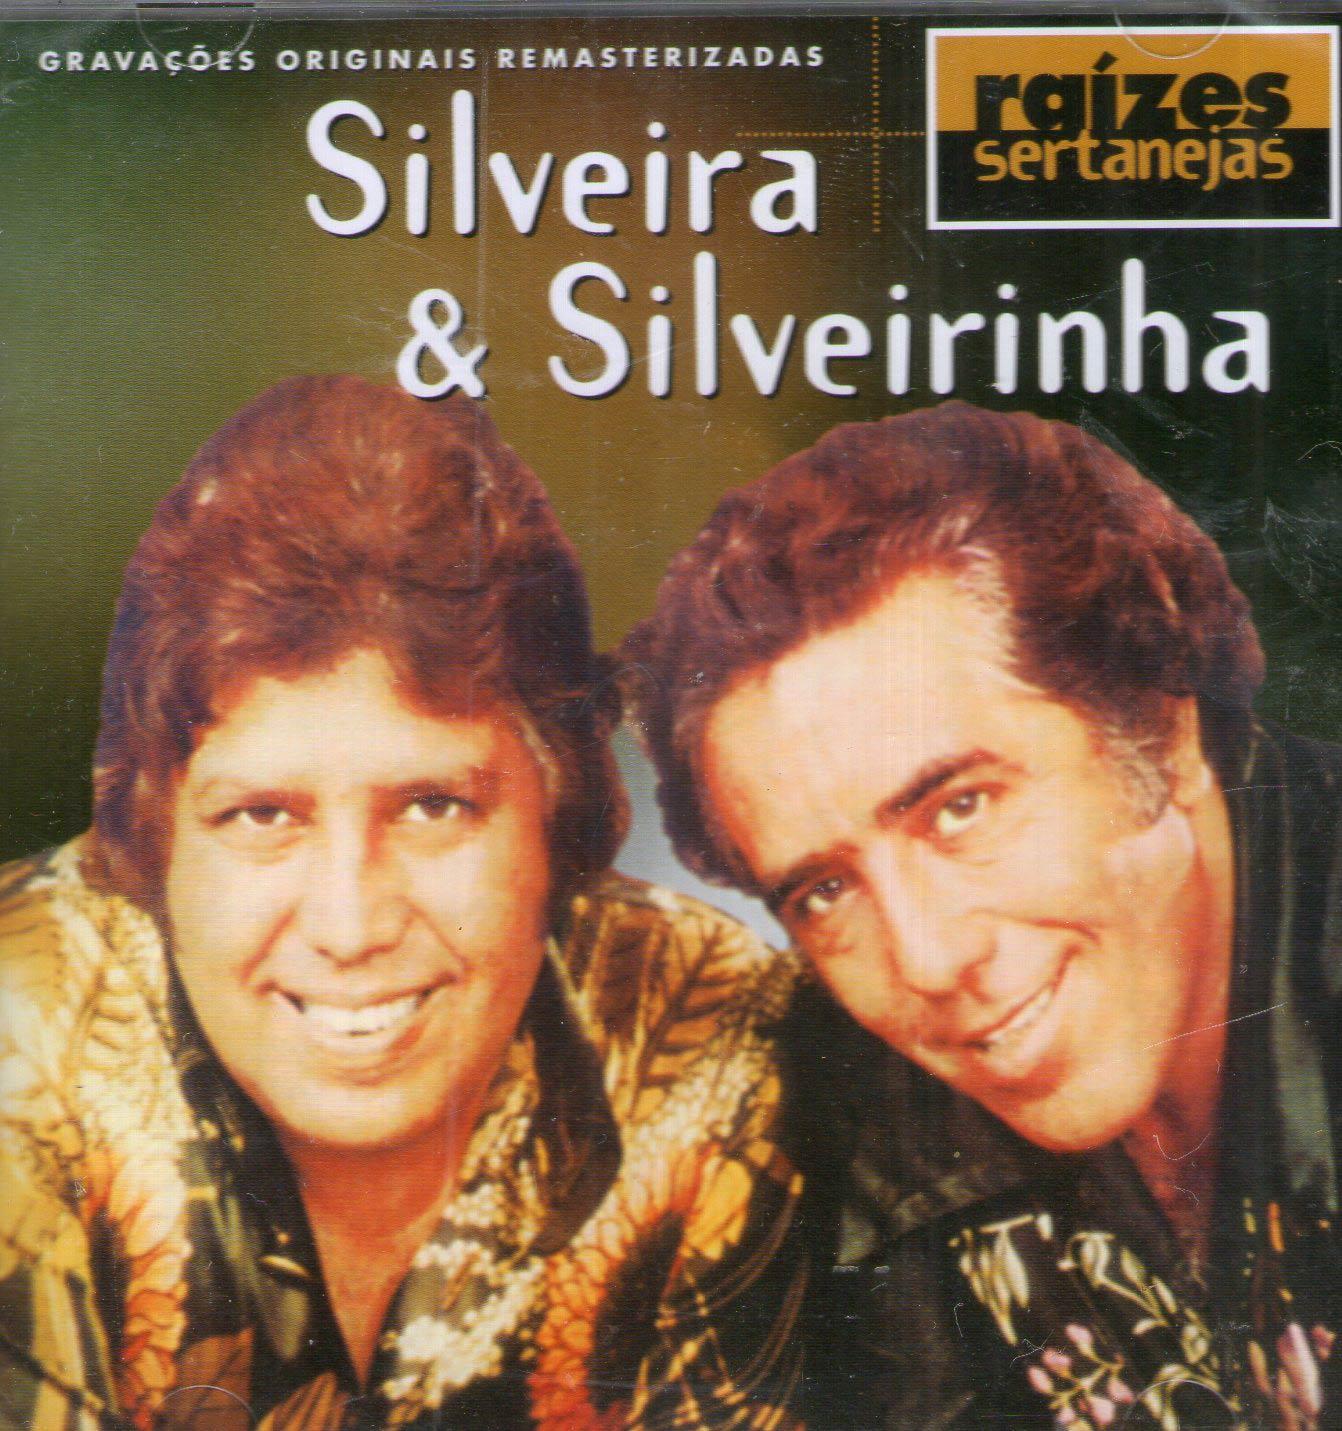 Silveira & Silveirinha – Raízes Sertanejas - CD